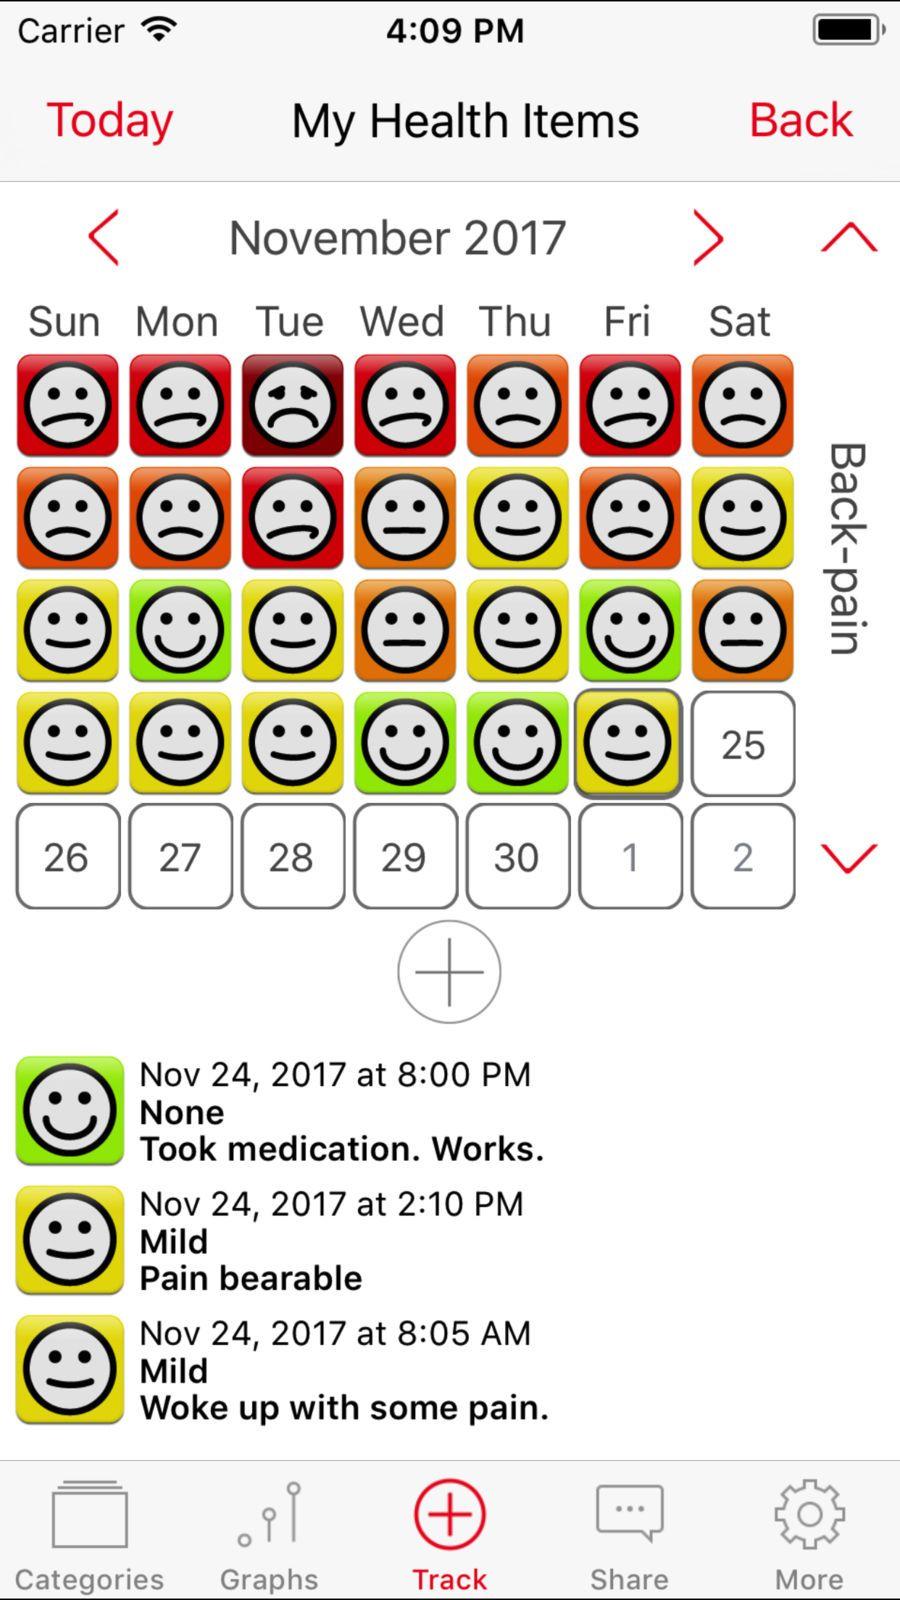 TracknShare LITE LLCAppsMedicalFitness Symptom